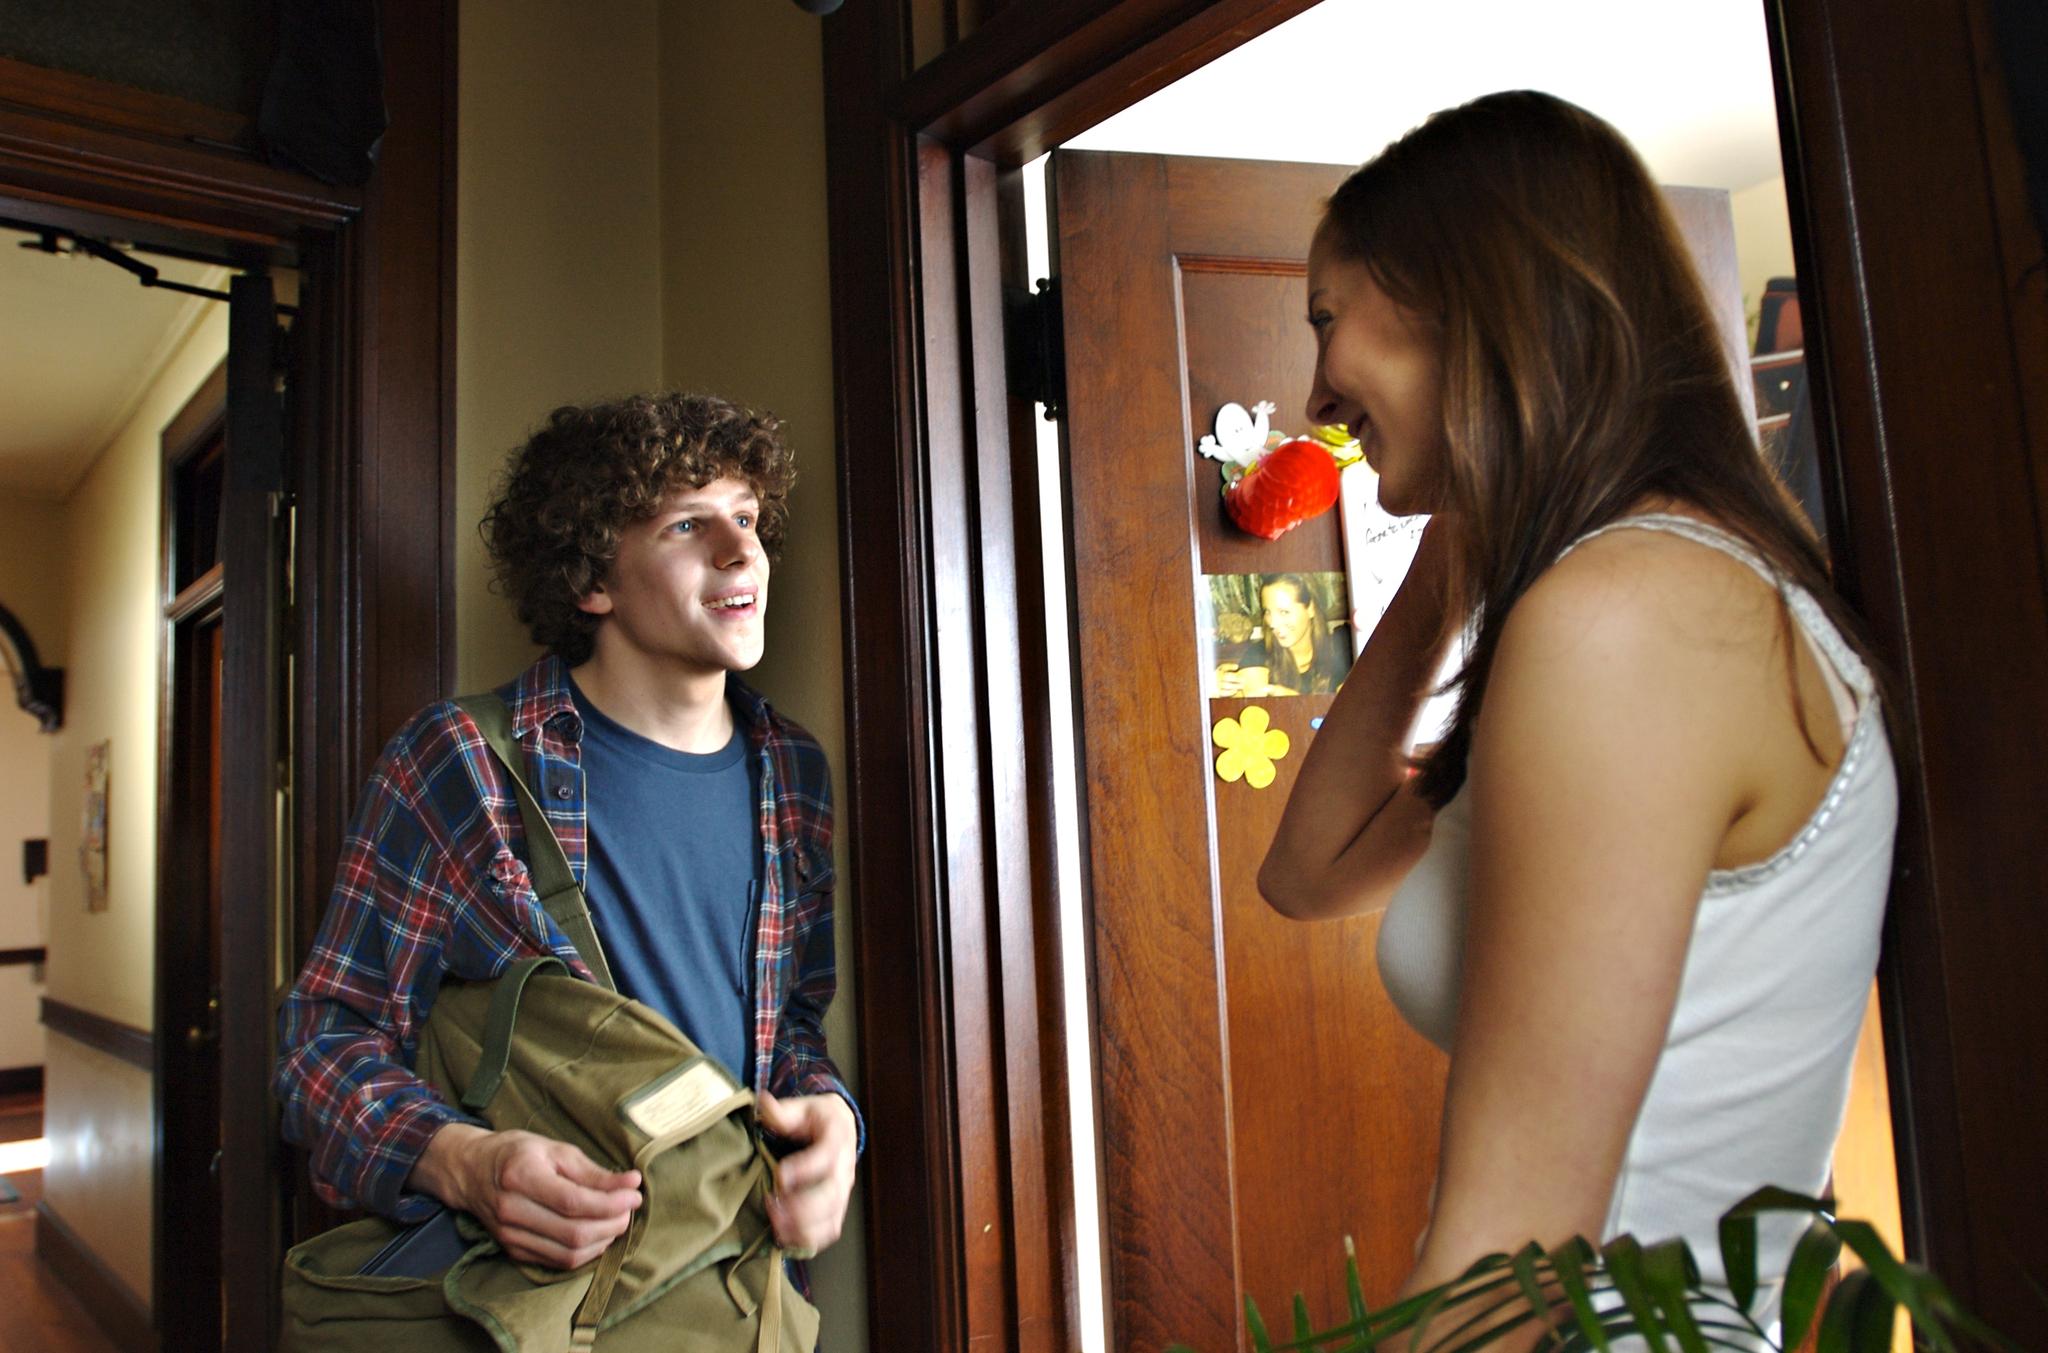 Eva Amurri and Jesse Eisenberg in The Education of Charlie Banks (2007)